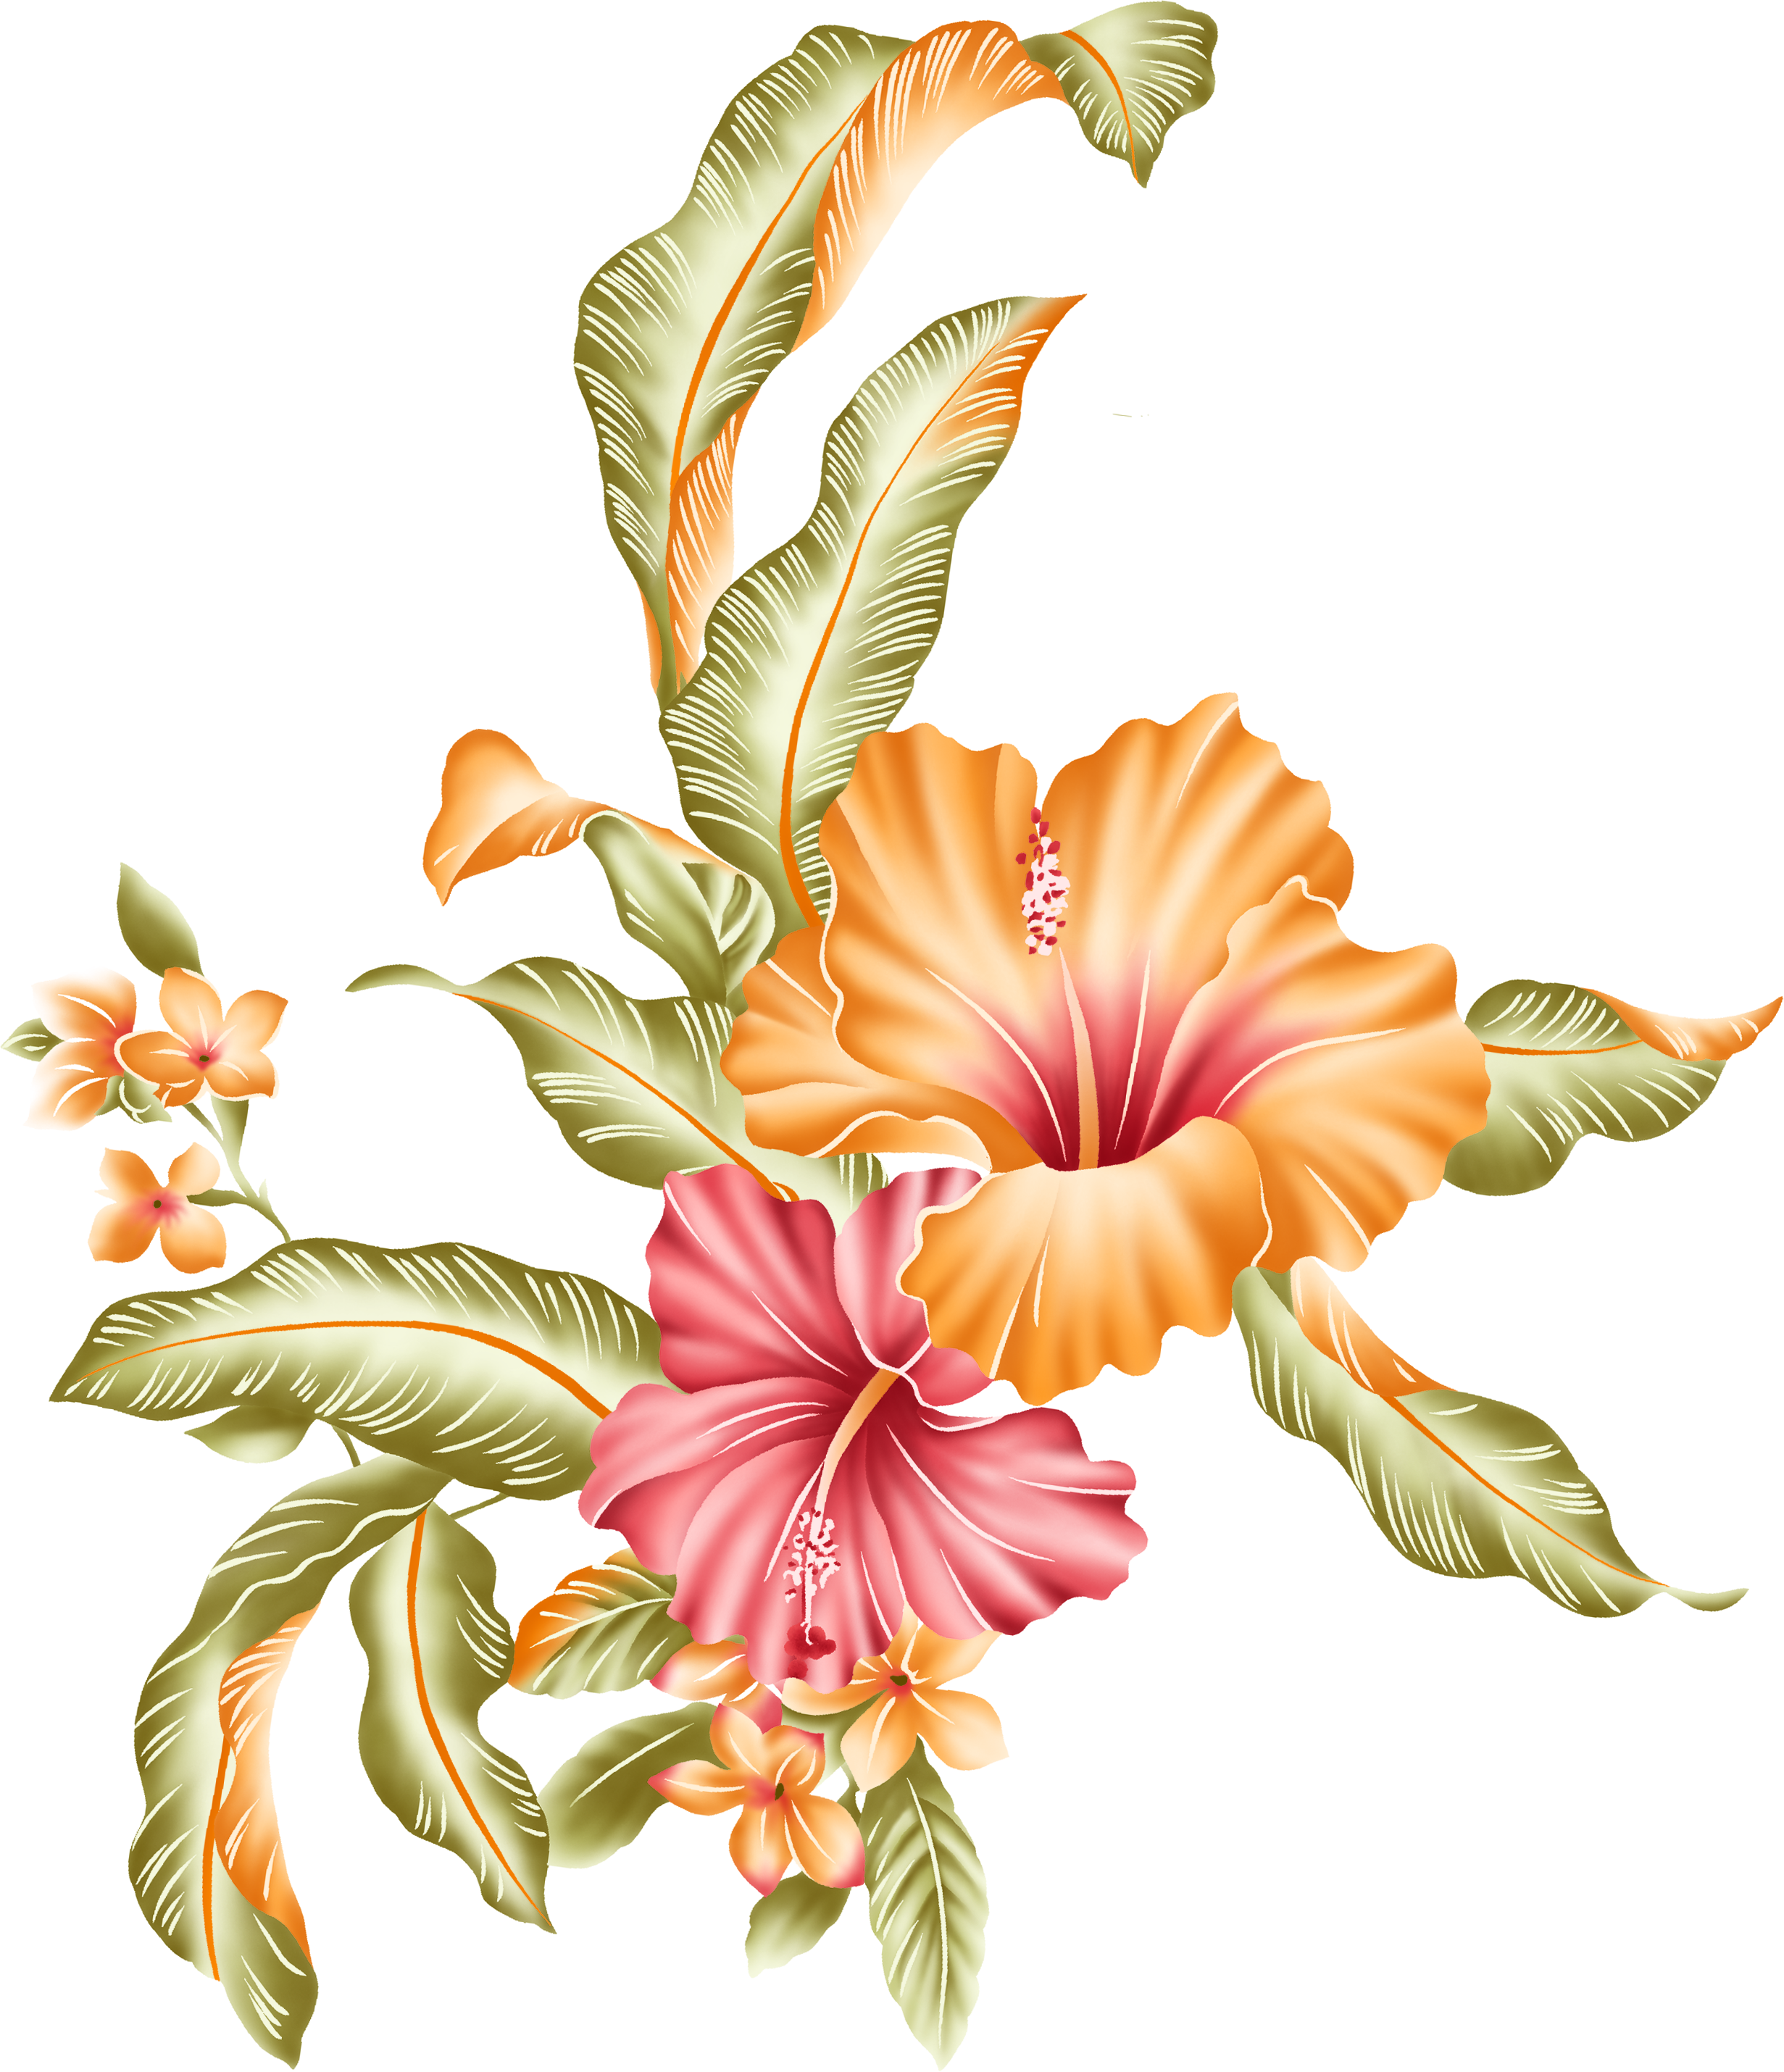 Цветы картинки рисунки на прозрачном, свадебному торжеству